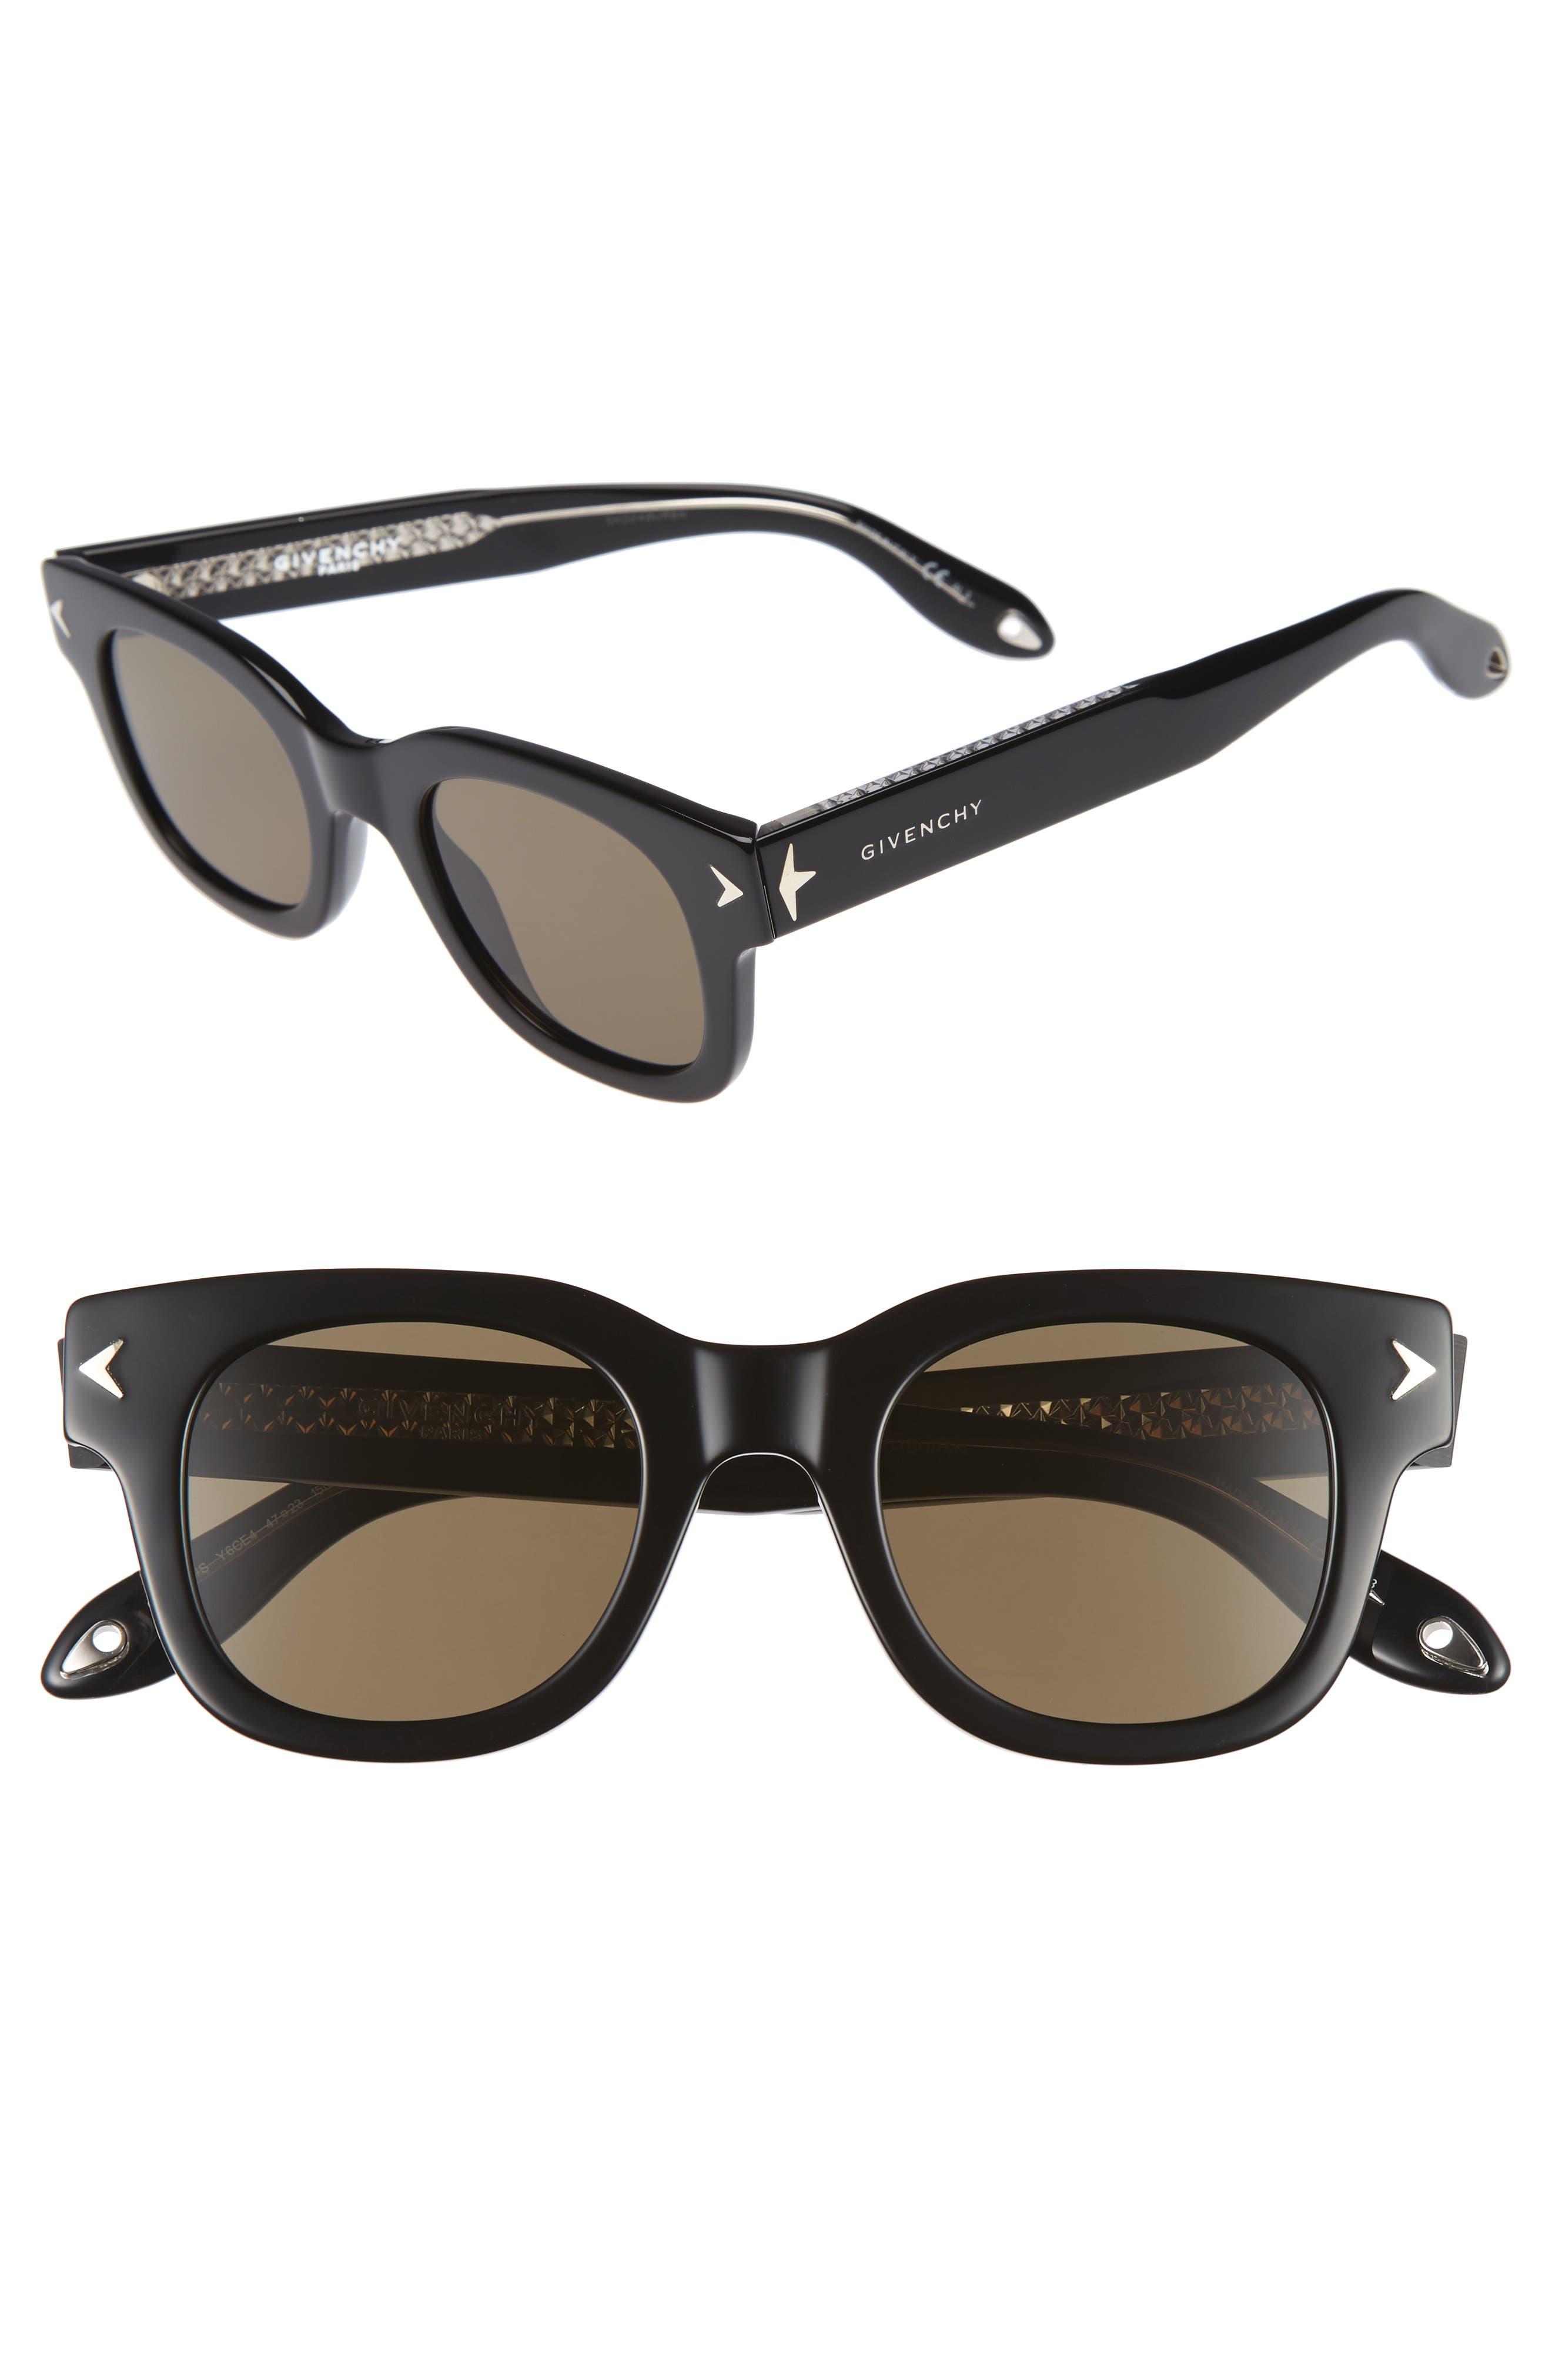 7037/S 47mm Sunglasses,                             Main thumbnail 1, color,